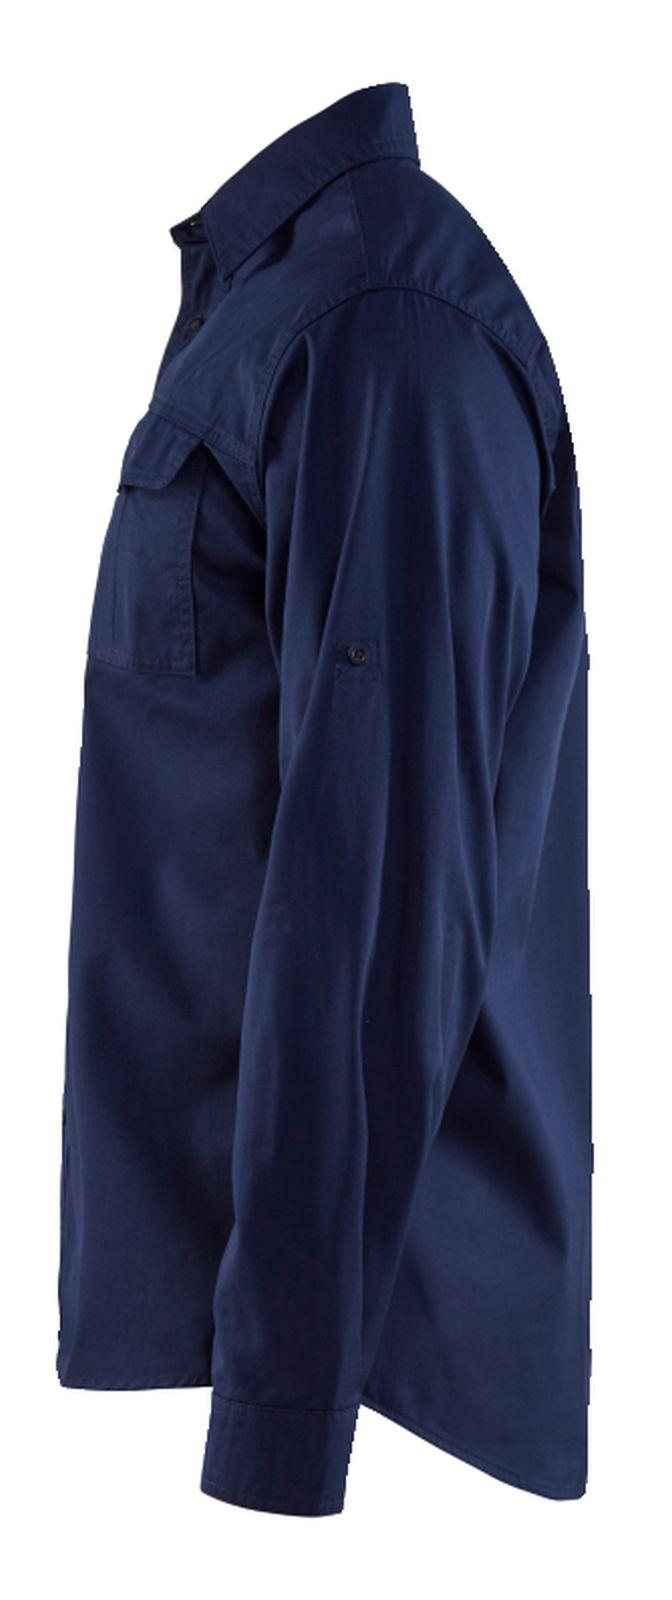 Blaklader Overhemden 32981190 marineblauw(8900)